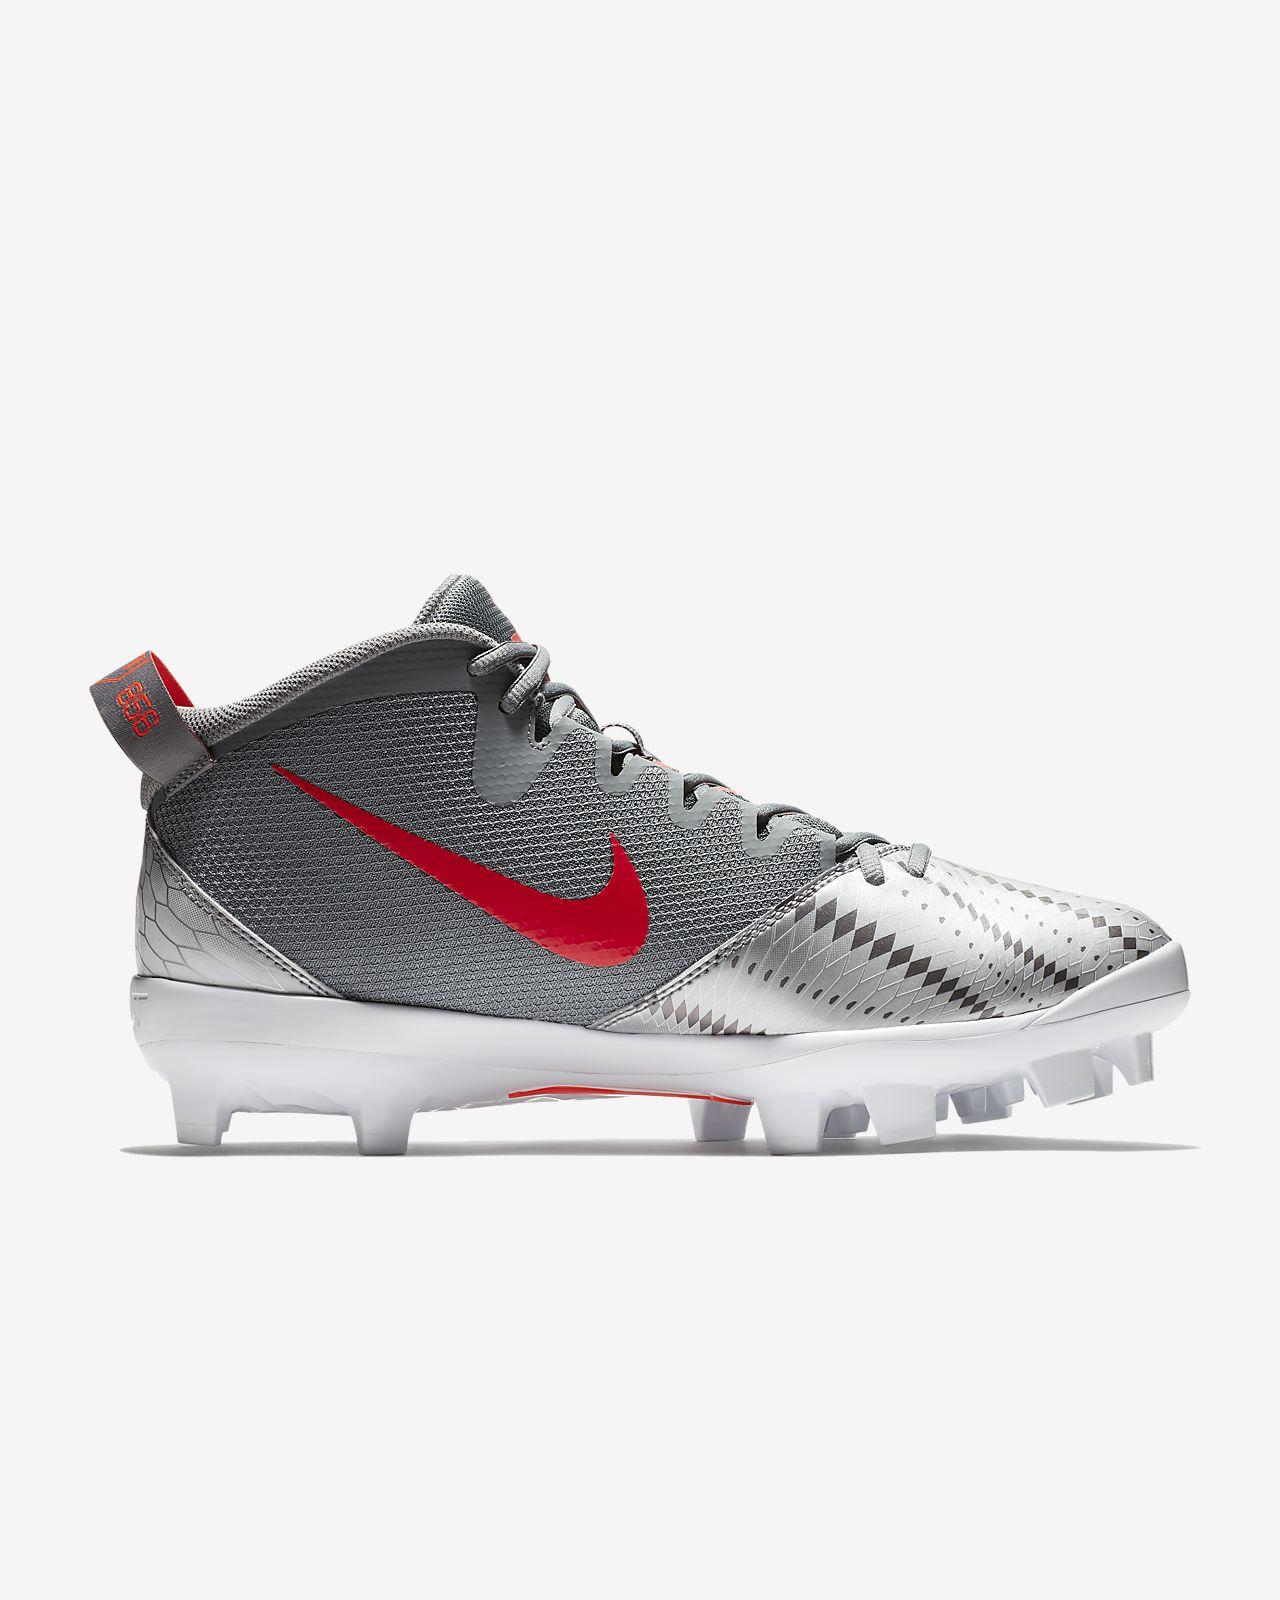 6d6dd7ee221 Nike Force Zoom Trout 5 Pro MCS Men s Baseball Cleat. Nike.com